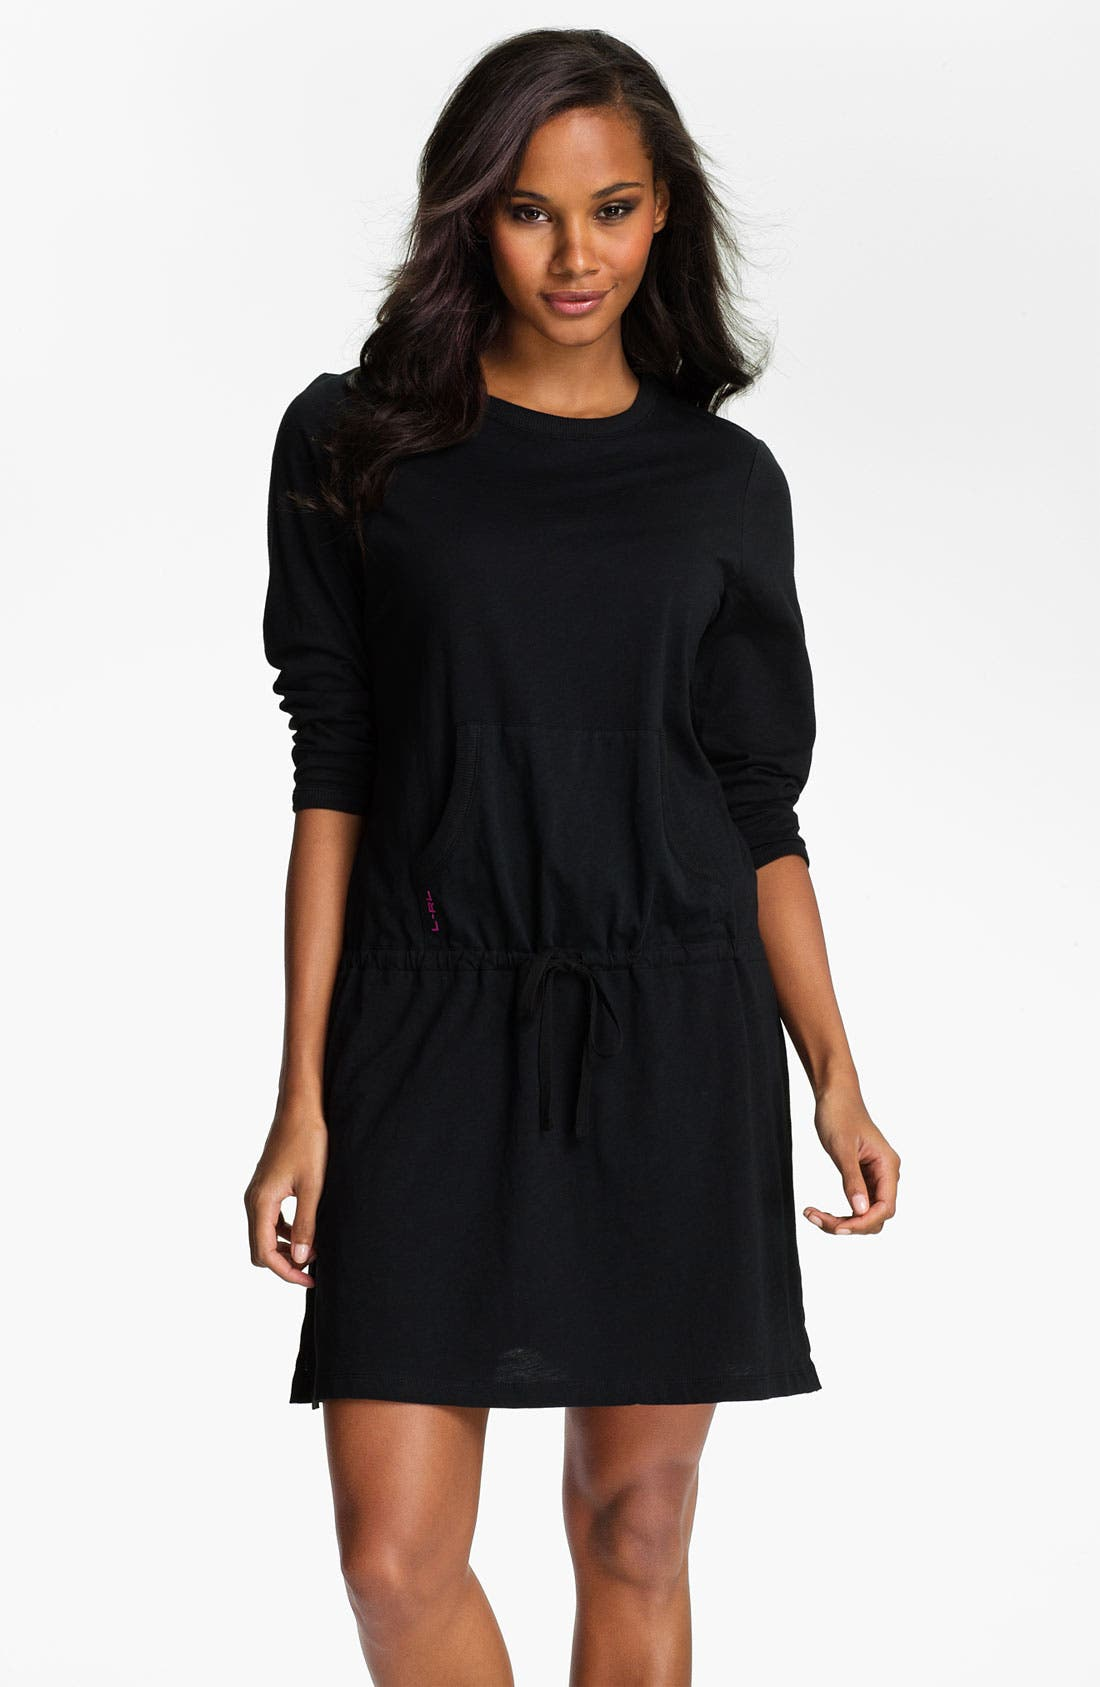 Alternate Image 1 Selected - Lauren Ralph Lauren Sleepwear Knit Lounge Dress